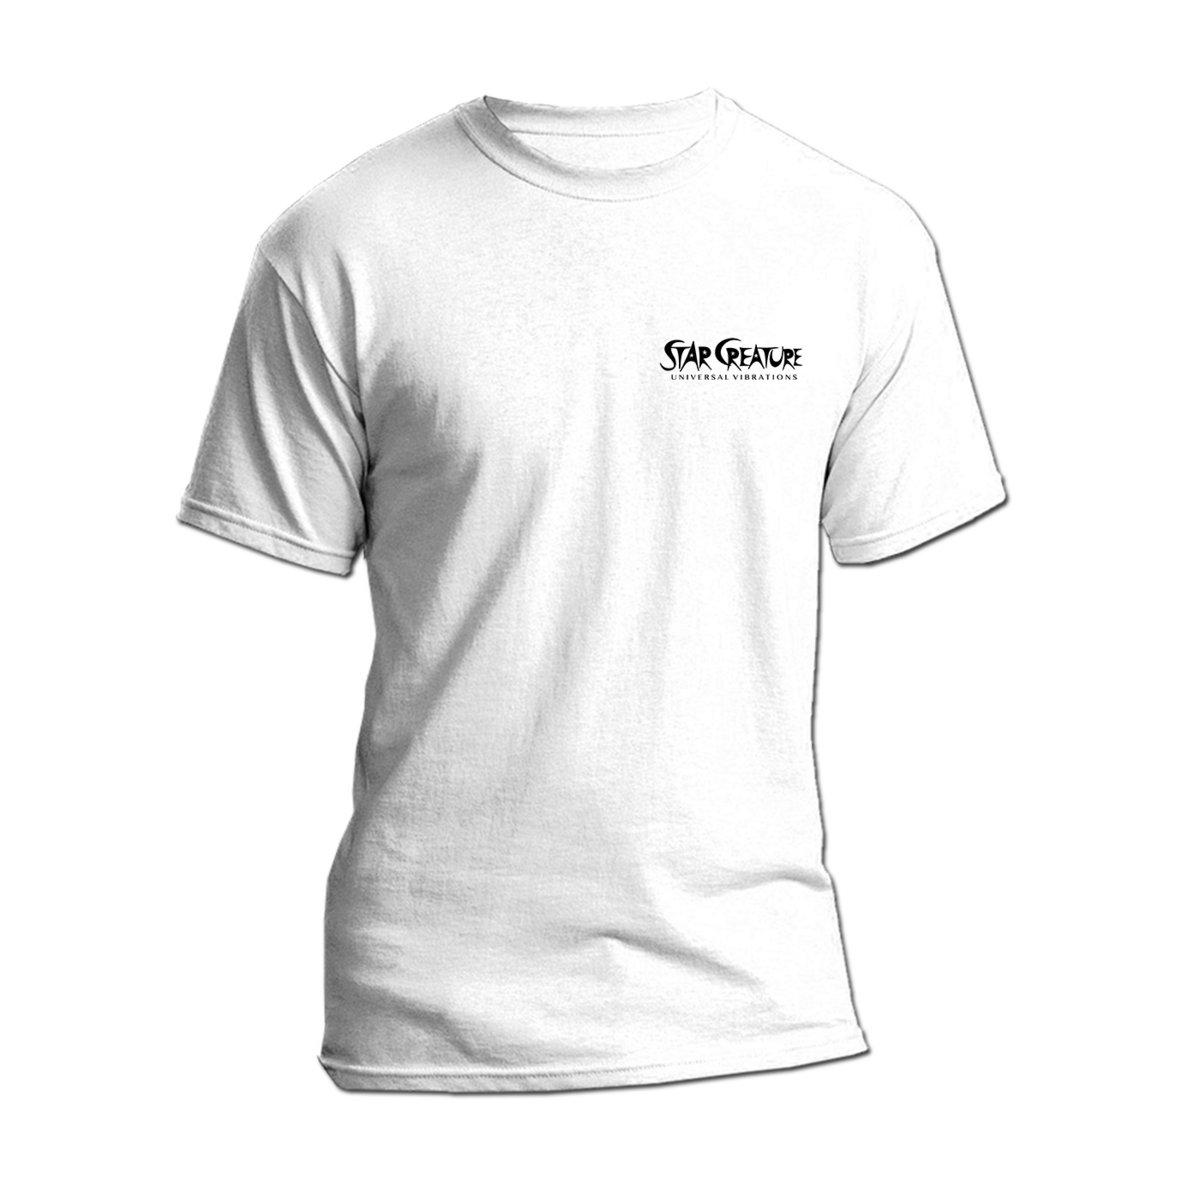 White Star Creature T-Shirt   Star Creature Universal Vibrations